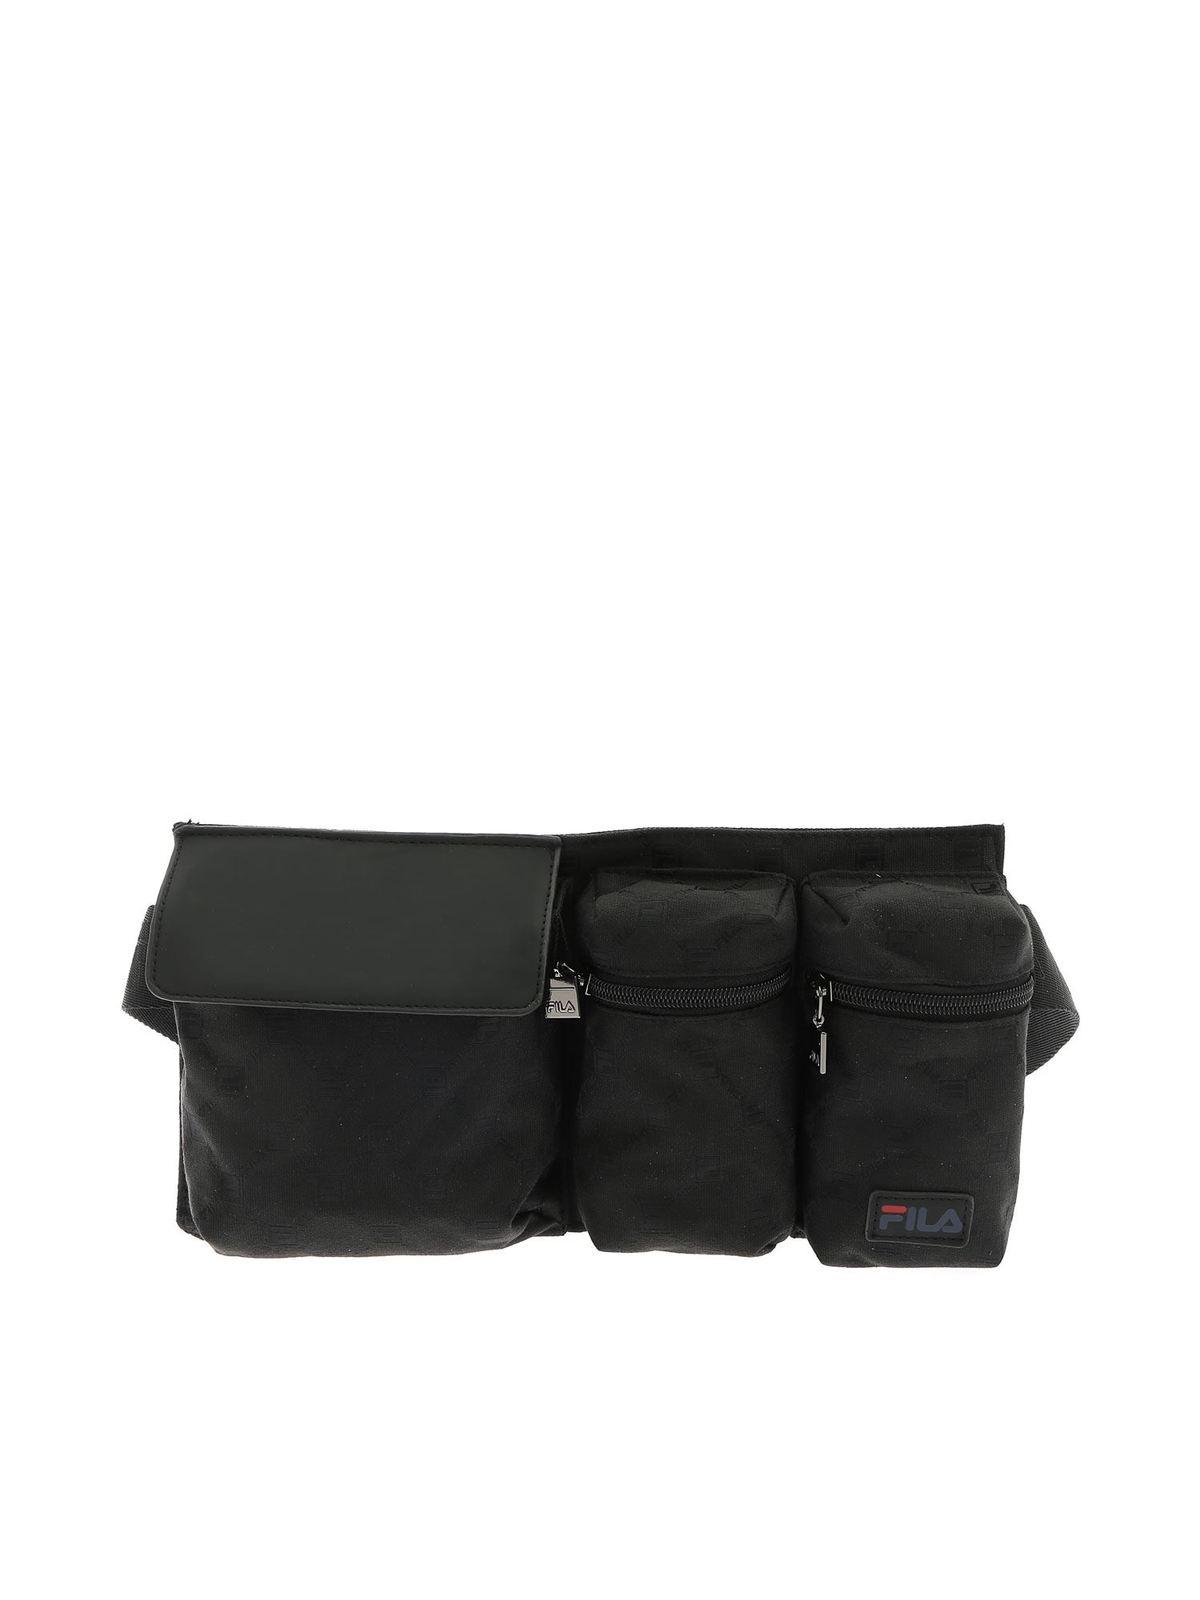 Fila BLACK BRANDED WAIST BAG